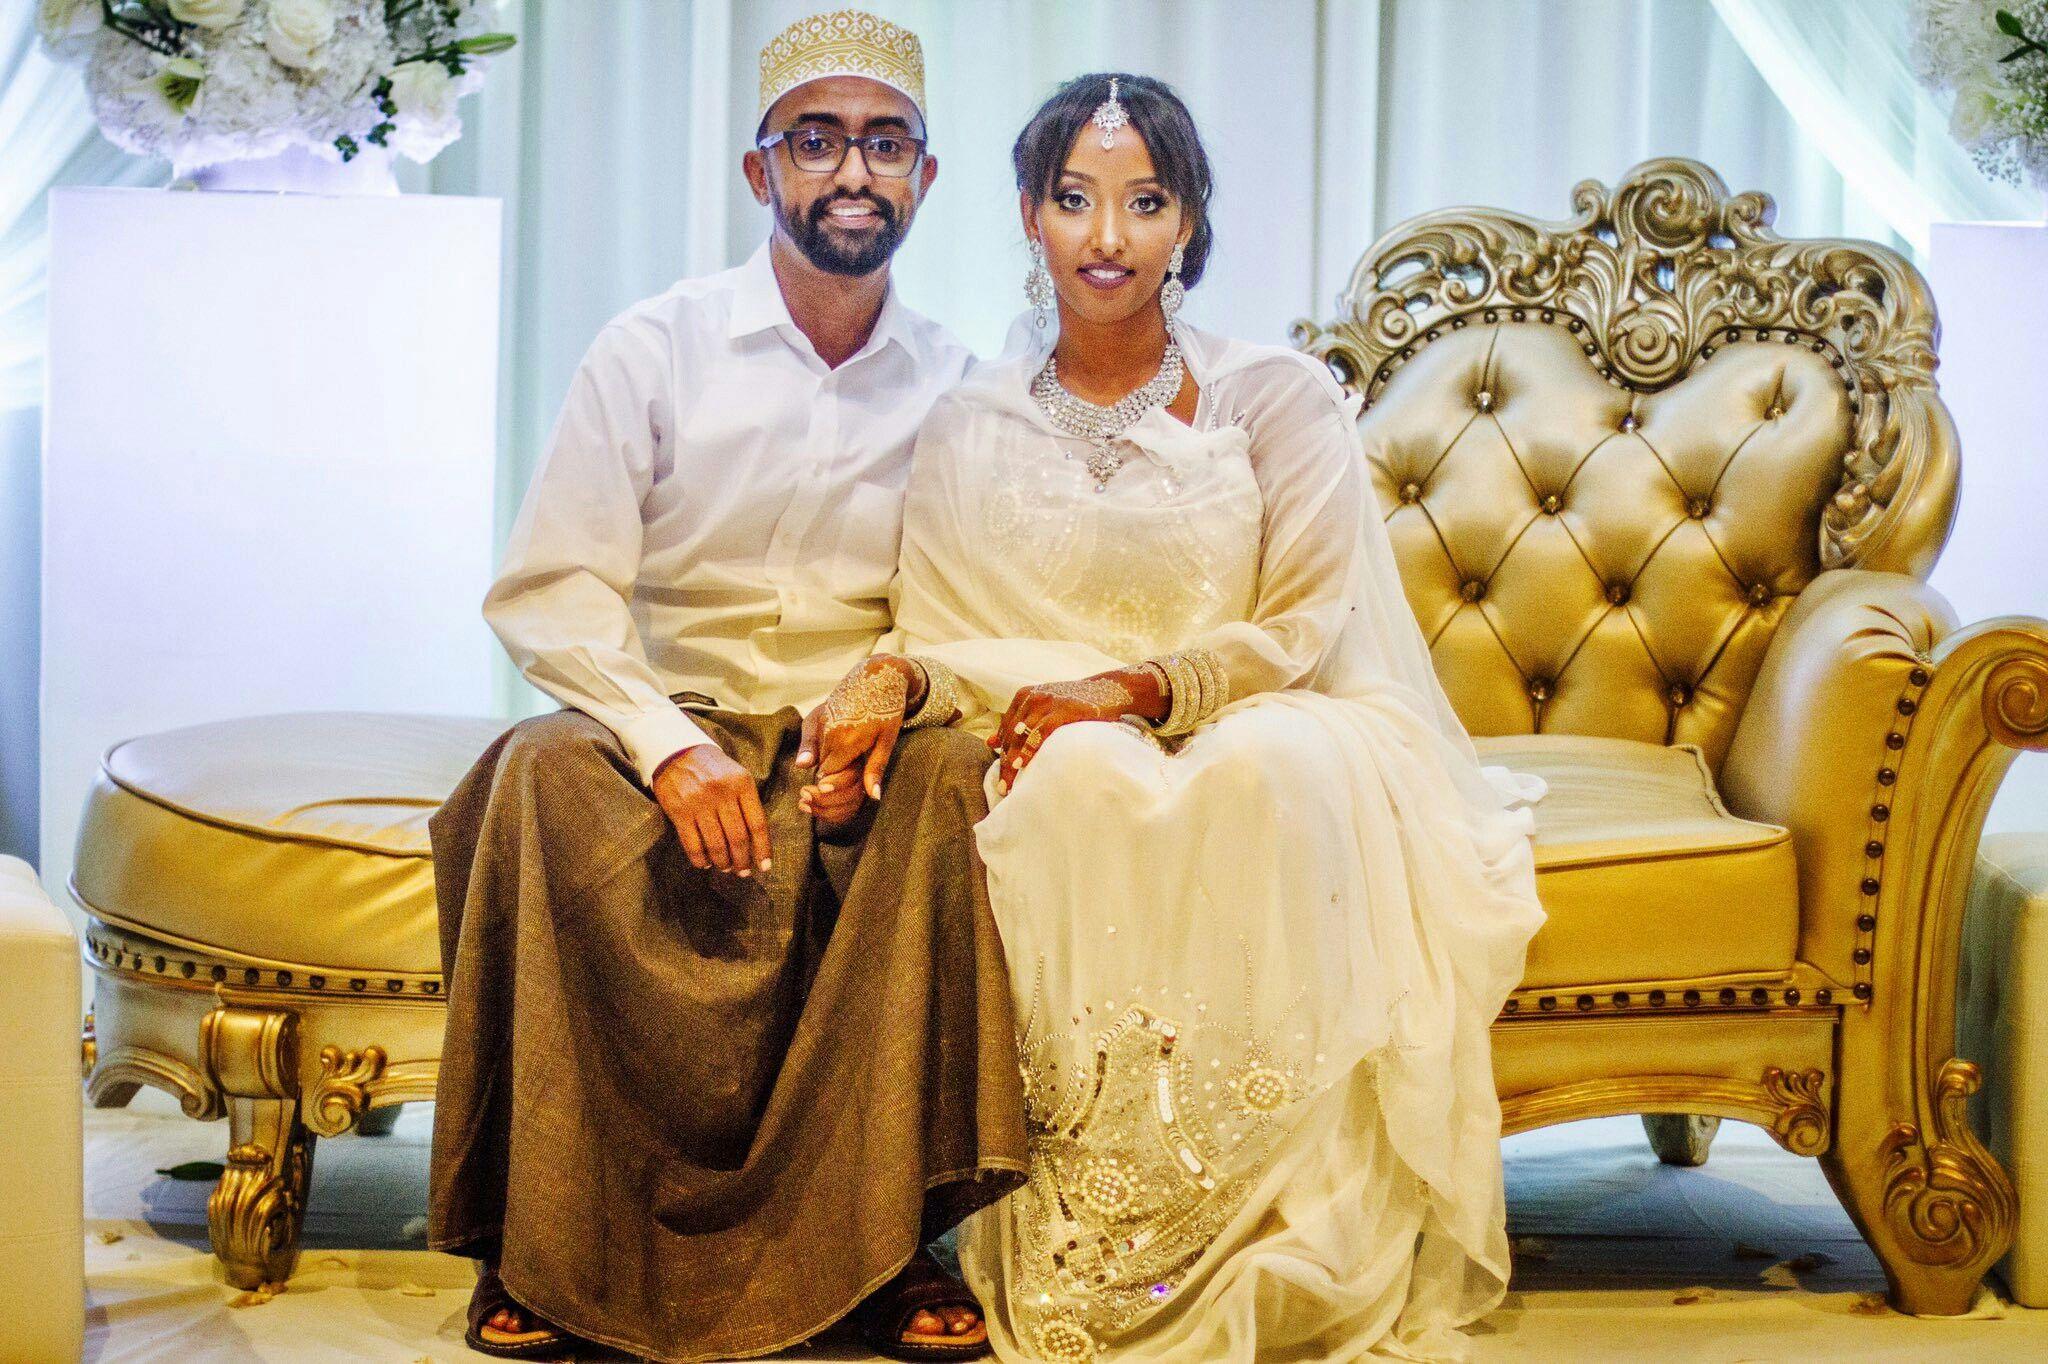 Traditional Somali women | Somali wedding, Traditional ... |Traditonal Somali Weddings